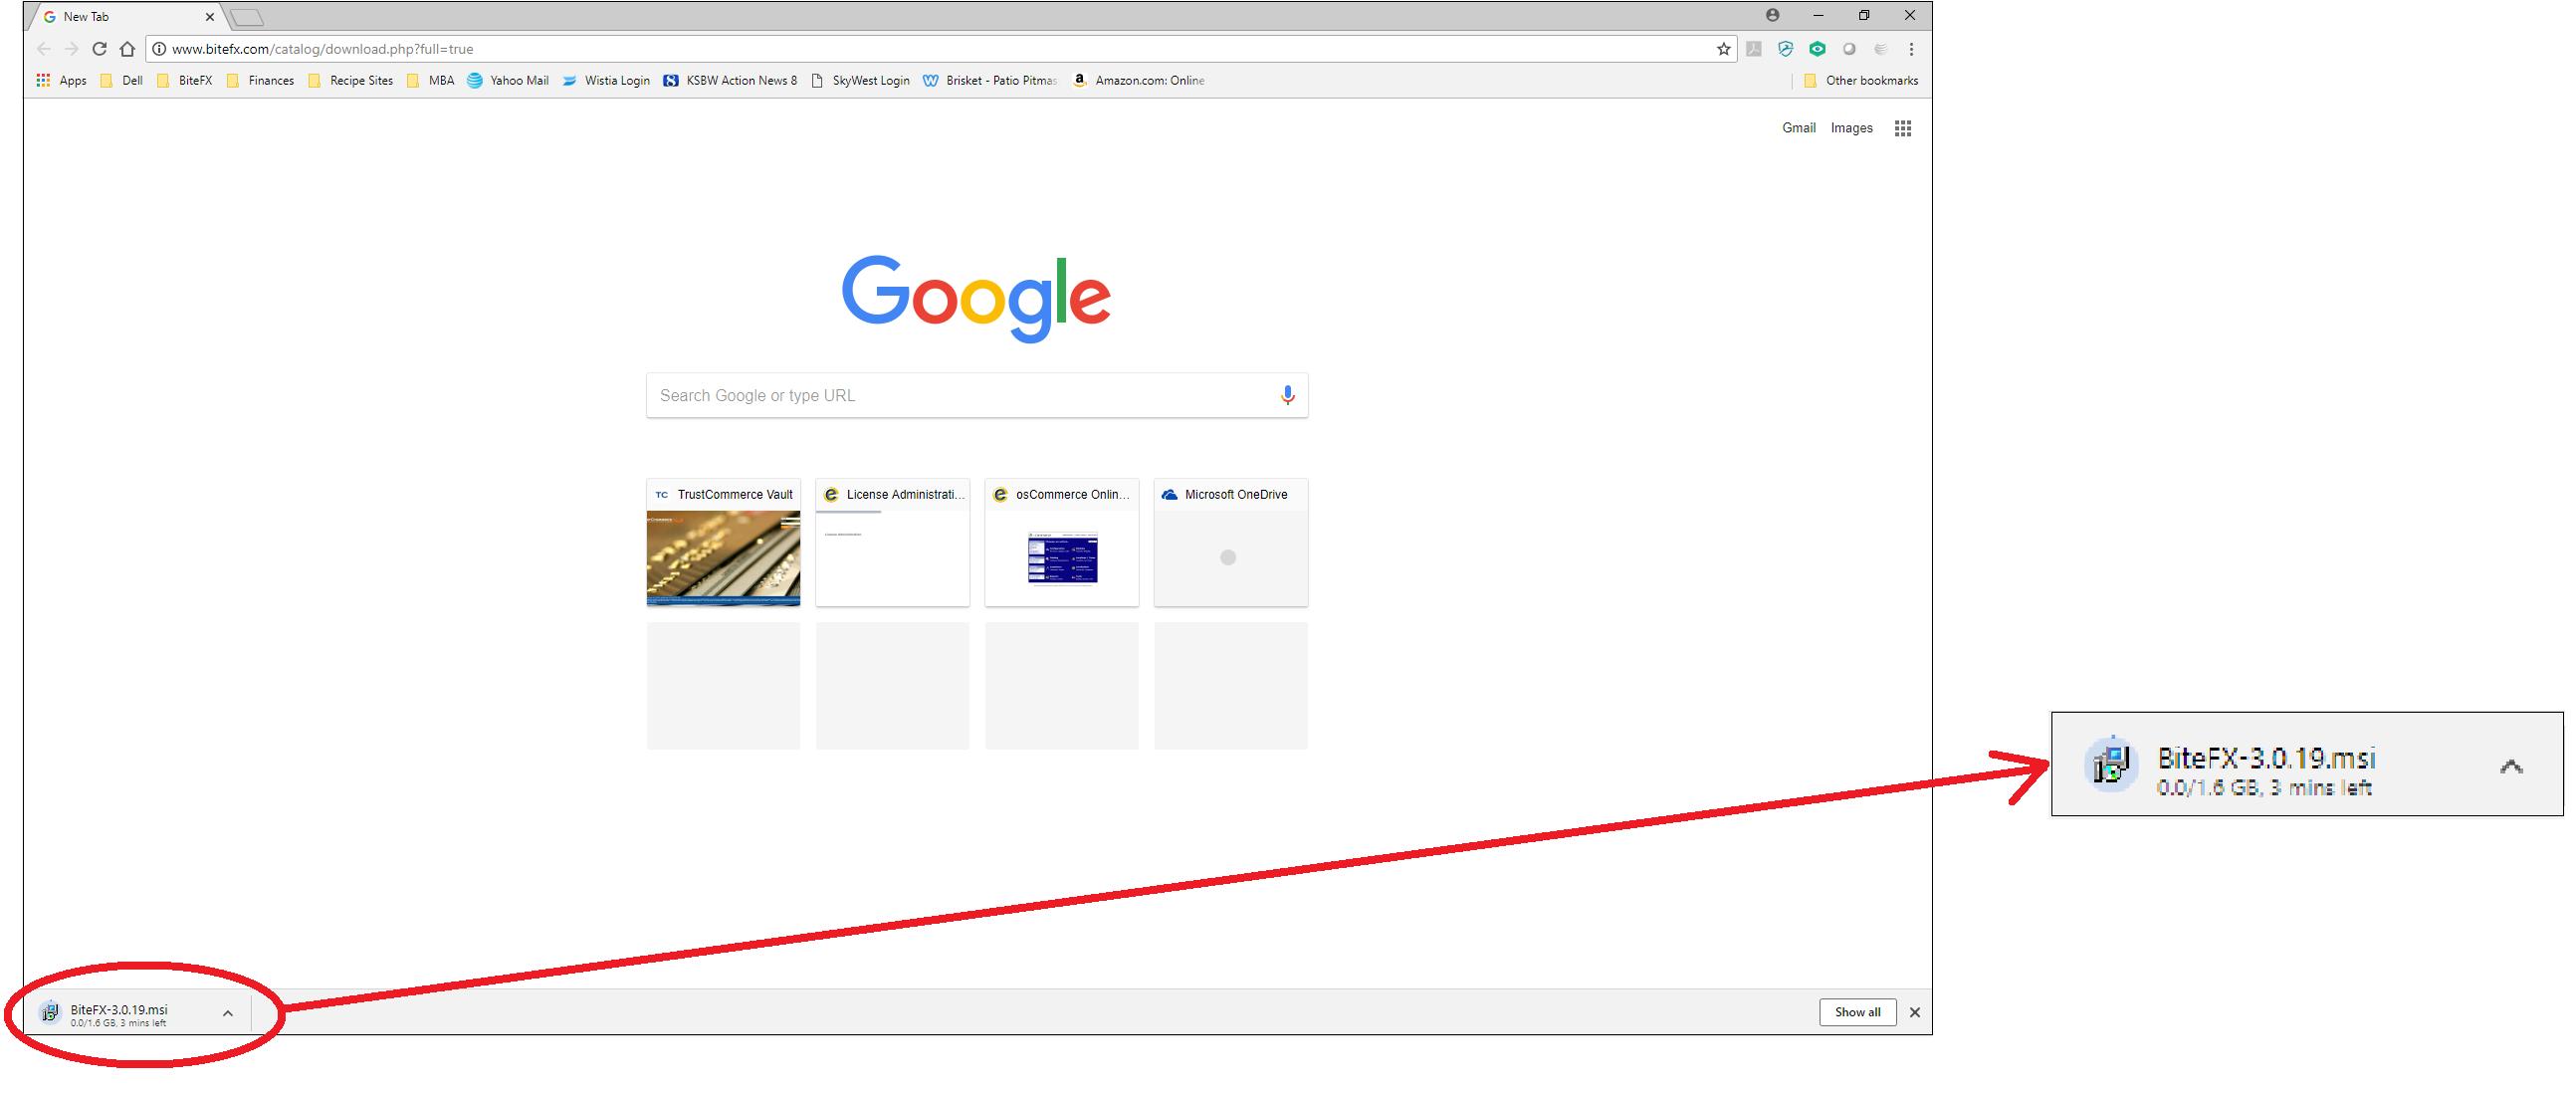 Google Download Image